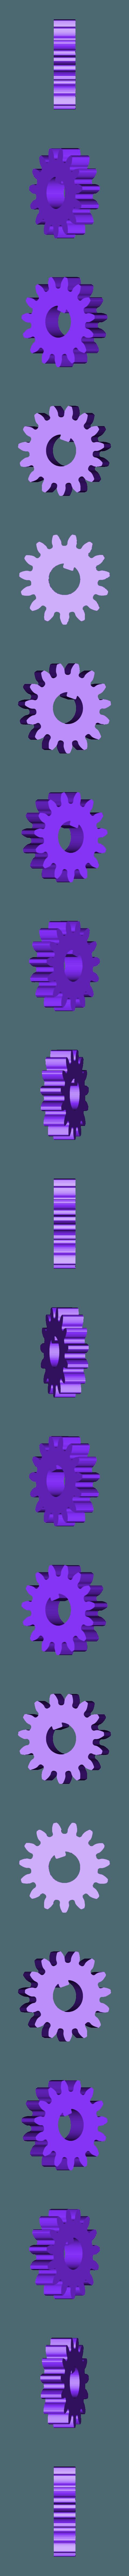 GEAR.stl Download STL file Armillary phone holder • 3D printer model, 3d-fabric-jean-pierre